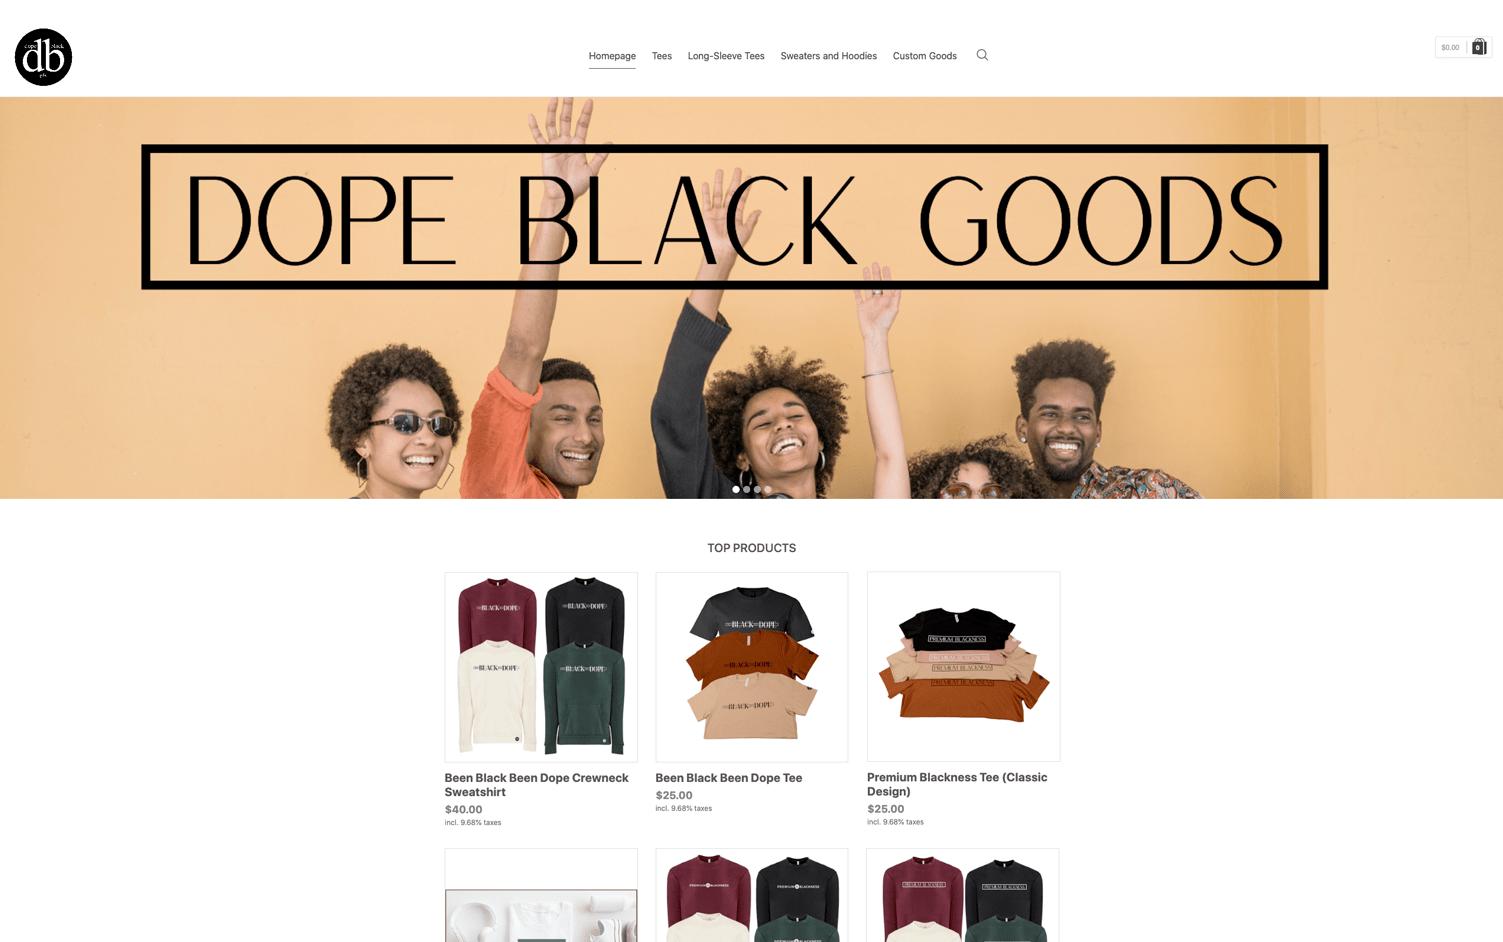 Dope Black Goods